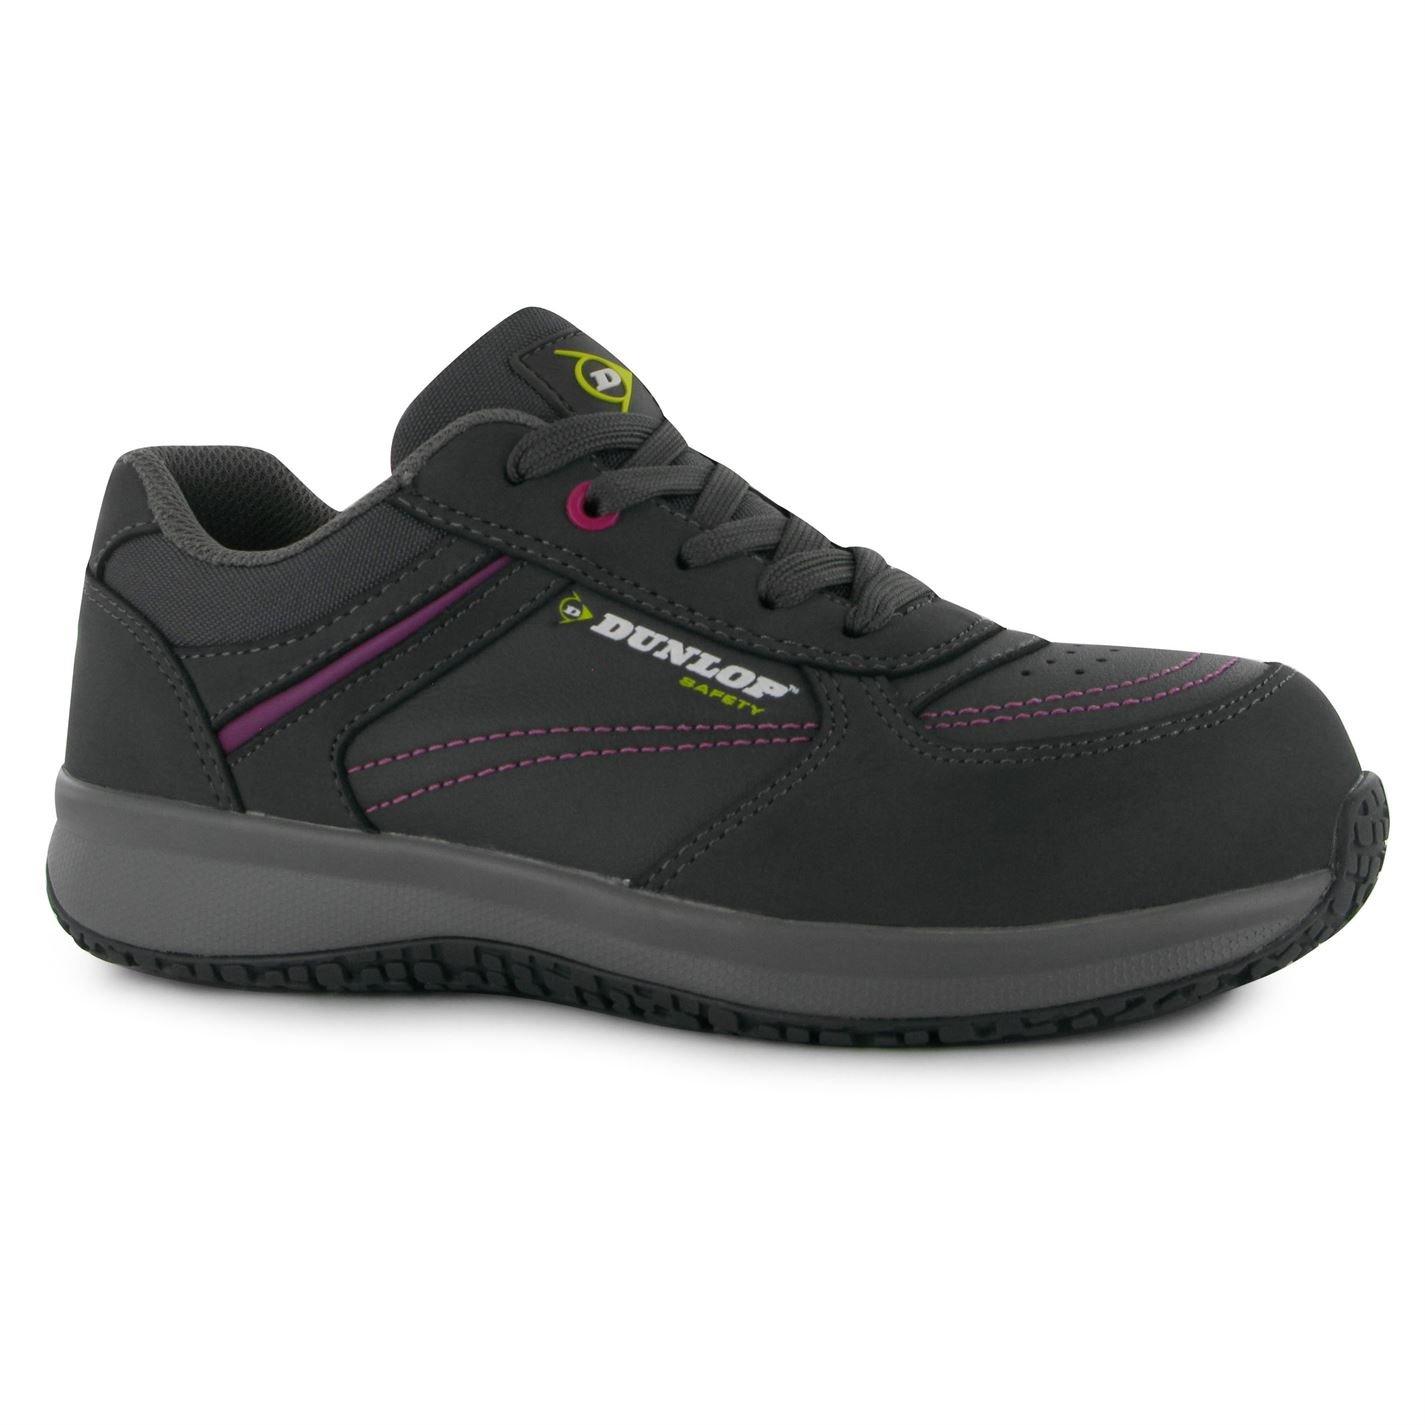 Dunlop Damen Kirsten Kirsten Damen Sicherheitsschuhe Arbeitsschuhe Schutzschuhe Schuhe Halbschuhe Grau/Pink 6 (39) - 580816